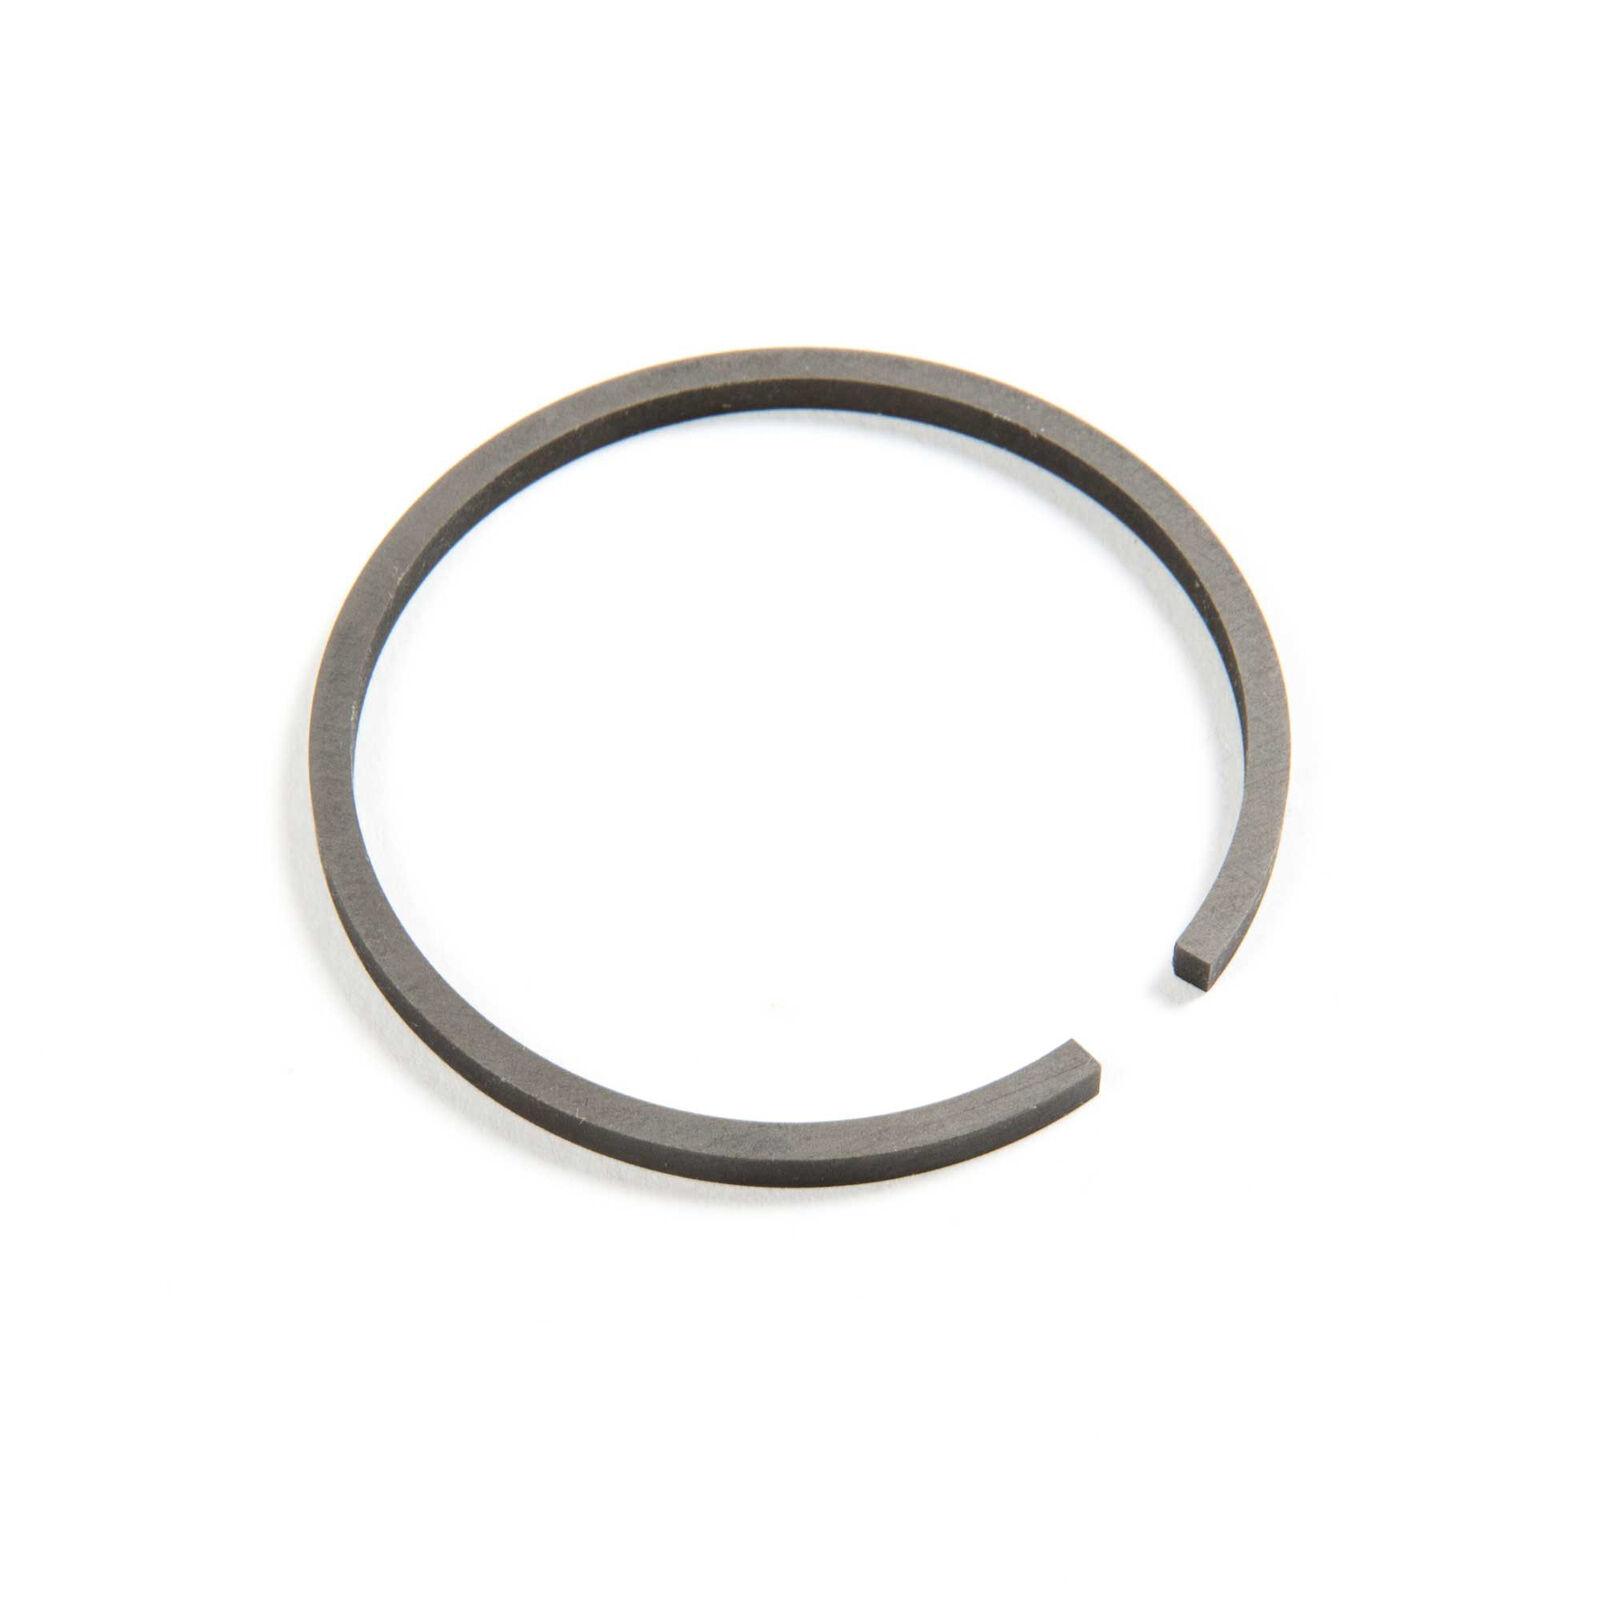 Piston Ring: FG-100TS